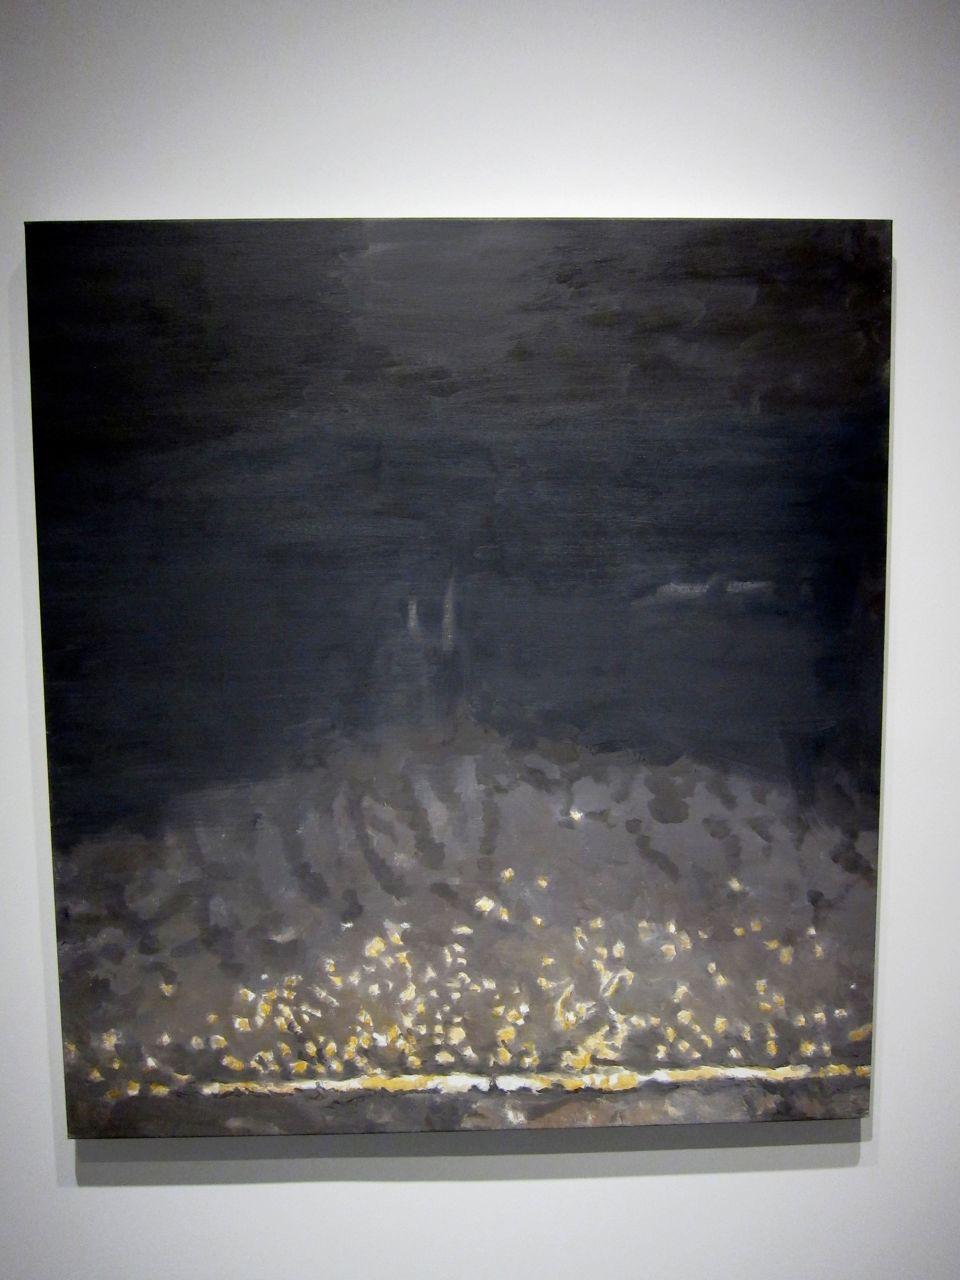 Murkami New Day Christies japan auction AM 12